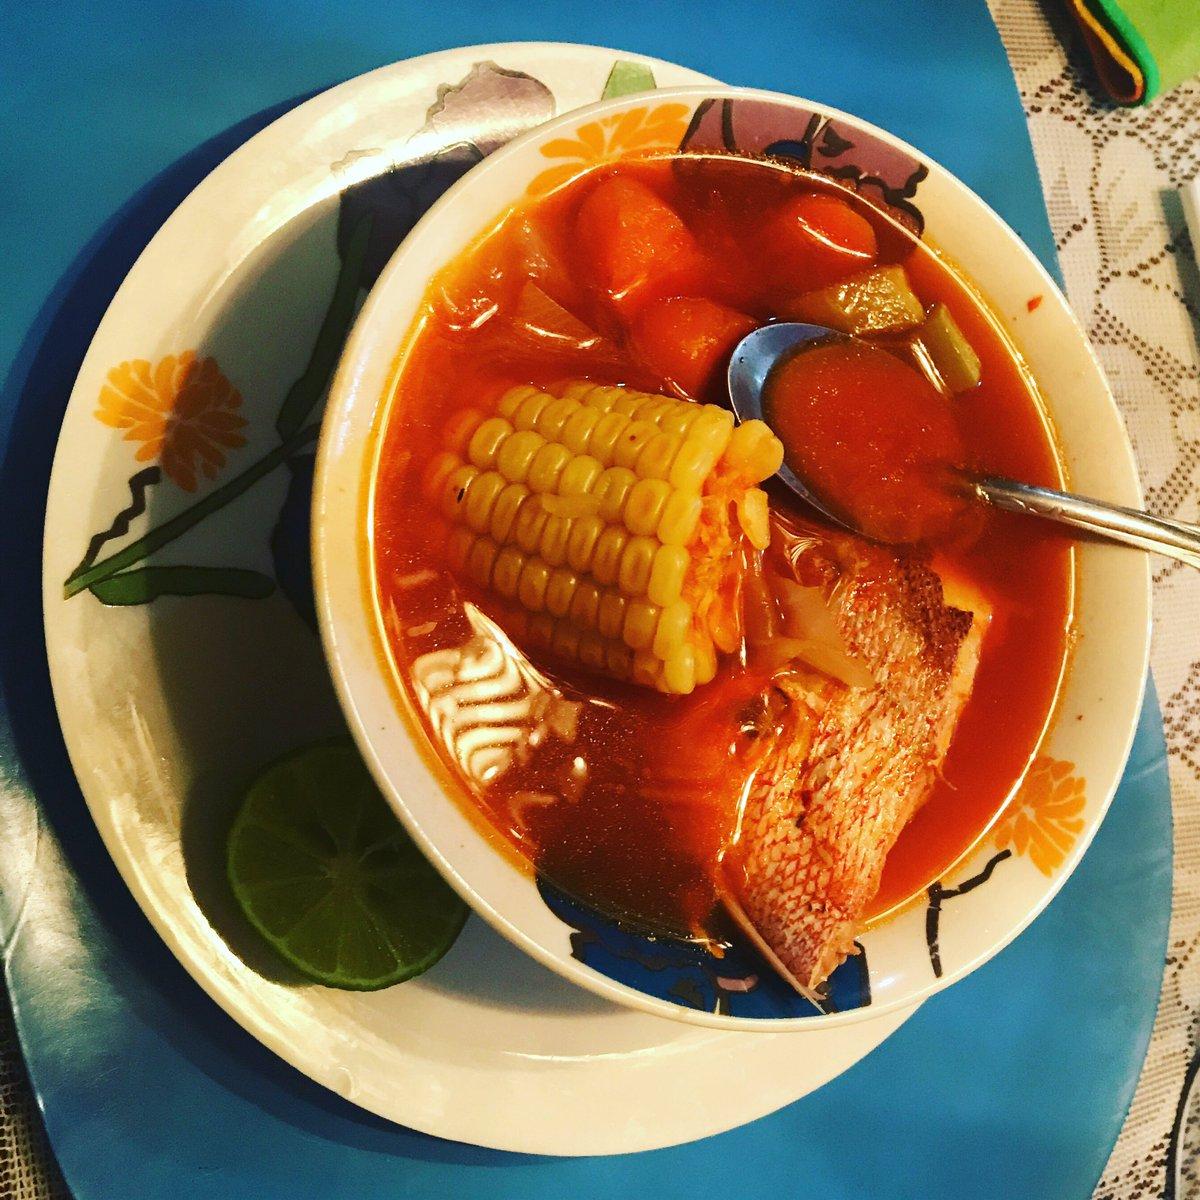 #Caldo de #Huachinango - #Tecnología de #Alimentos #QFB #Mexicano #Nicolaita #ÁGORA - #LindauParaSiempre (#LindauForLife)